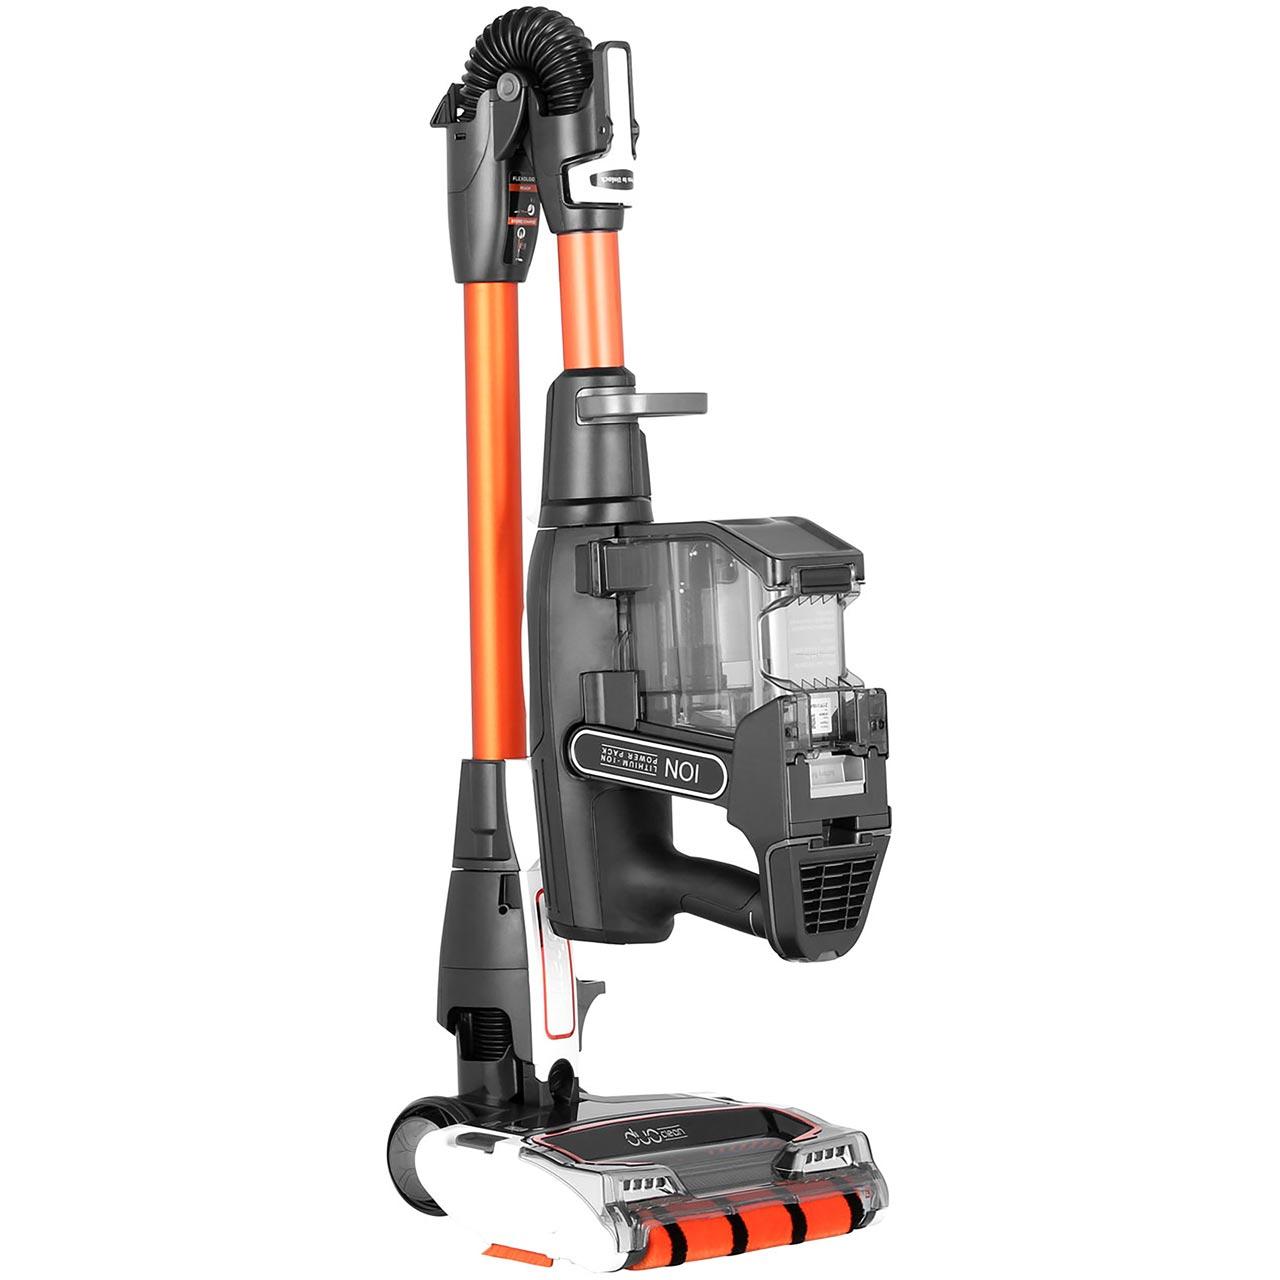 Shark If250uk Duoclean With Flexology Cordless Vacuum